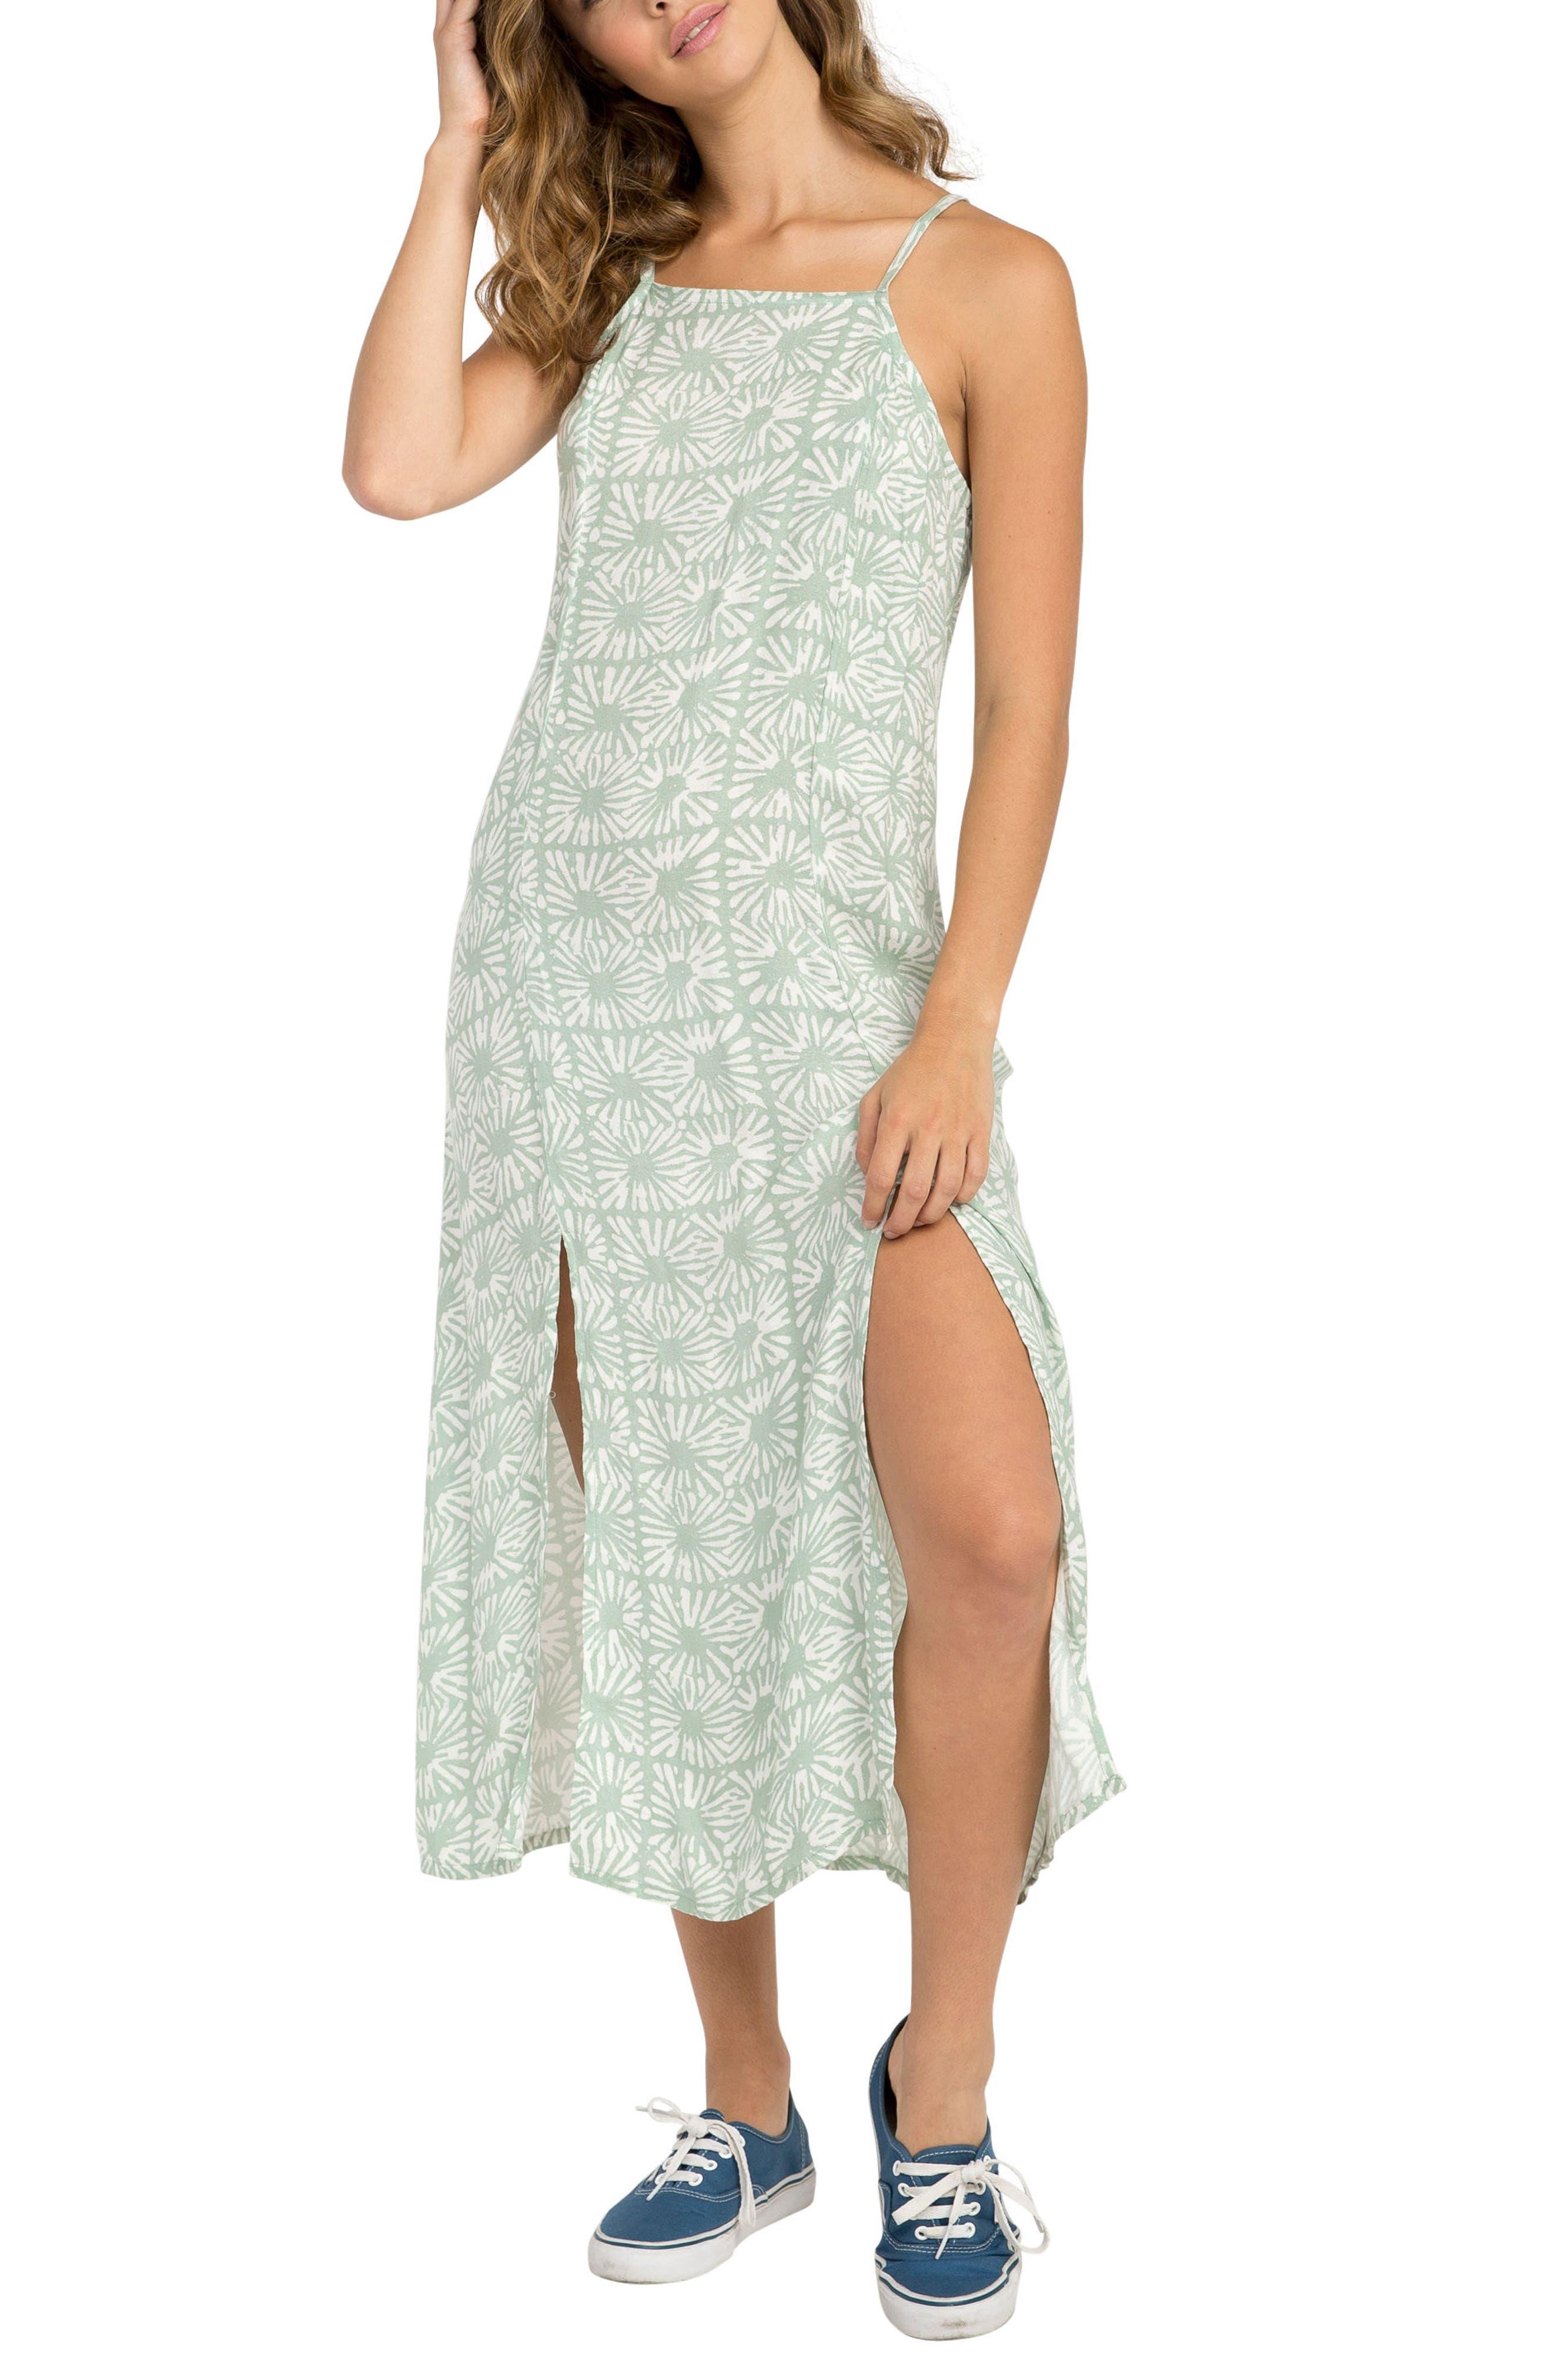 Garland Print Midi Dress,                             Main thumbnail 1, color,                             Artichoke